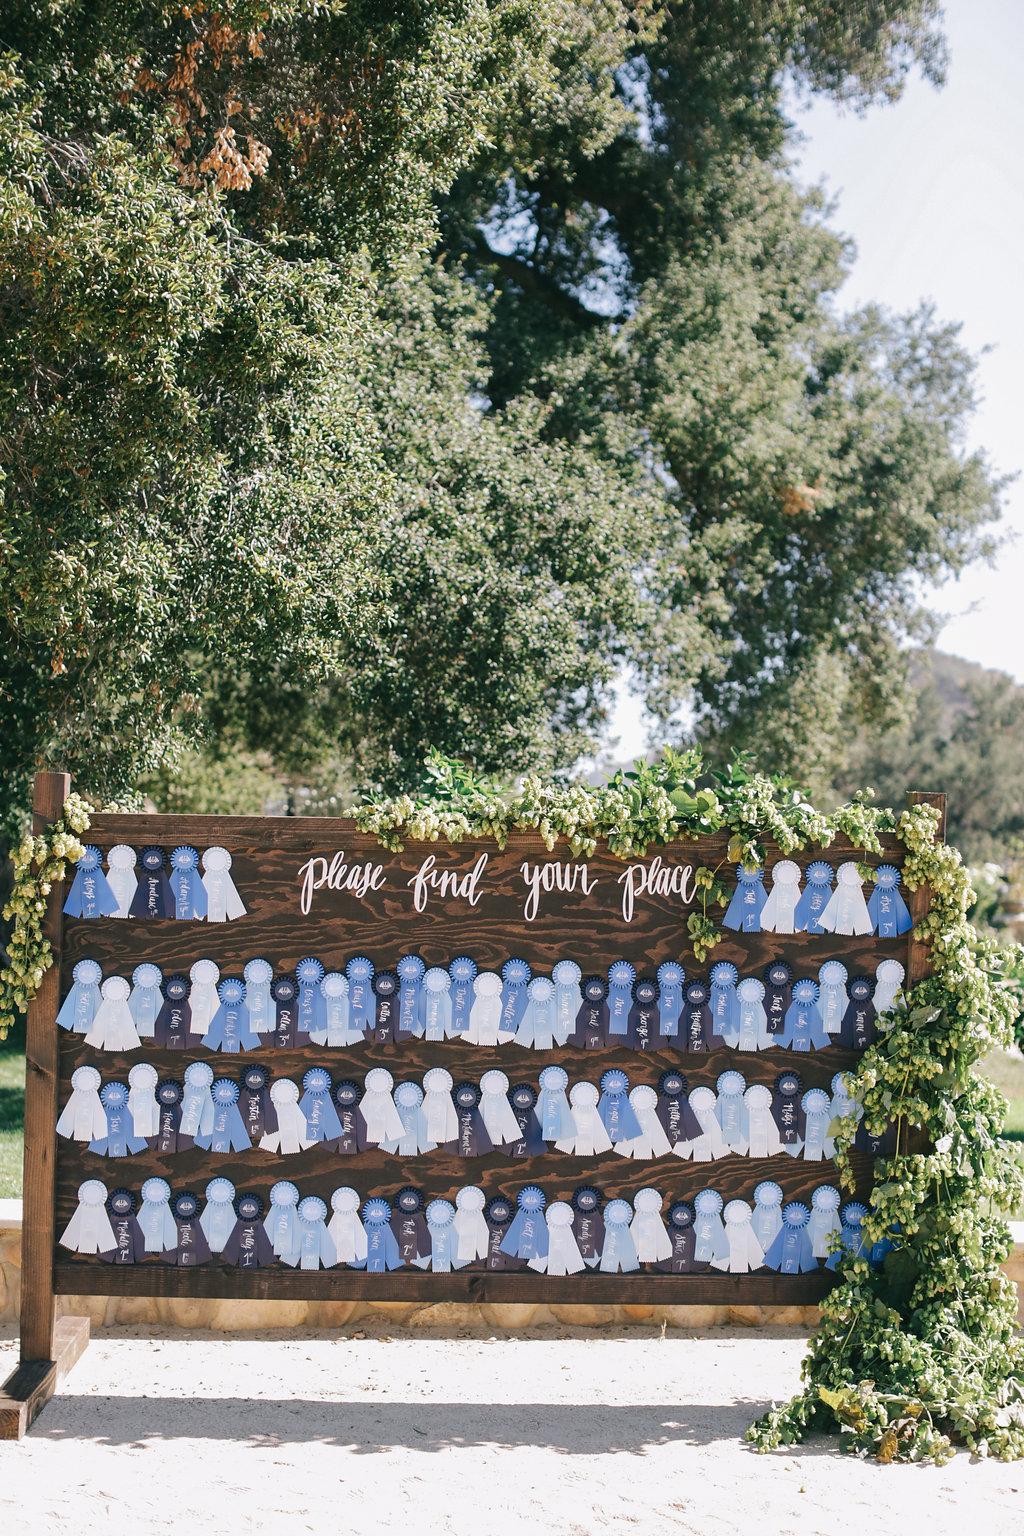 LVL Weddings and Events Brandon Kidd Equestrian Wedding (100).jpg